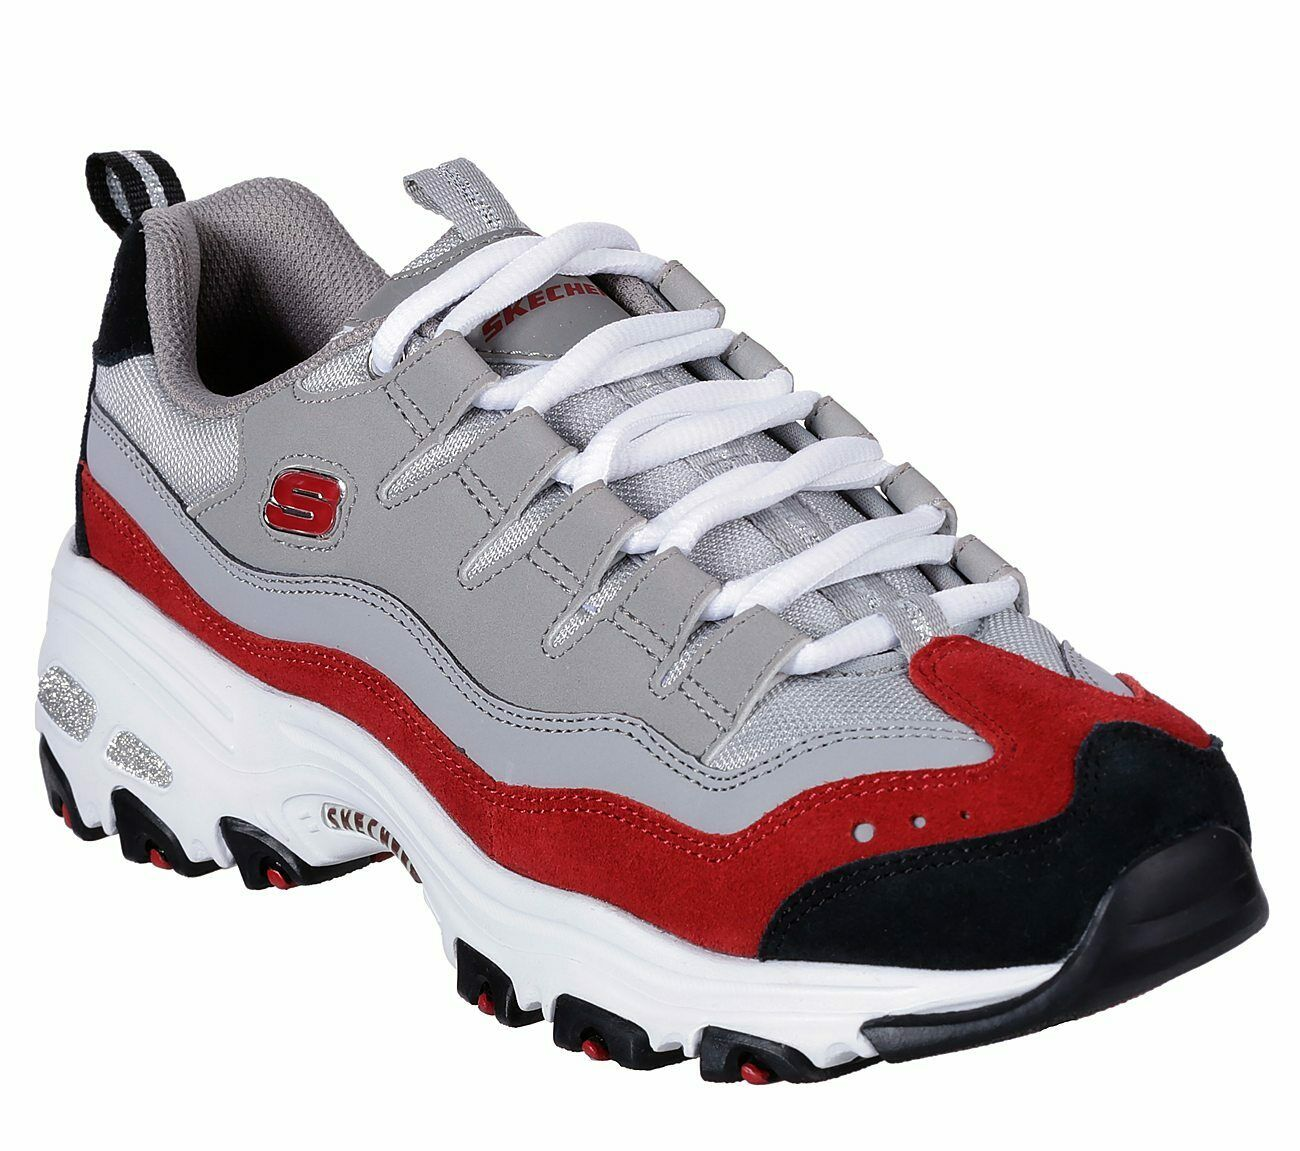 Skechers Dlites Gray Red shoes Women Sport Memory Foam Casual Comfort Soft 13141